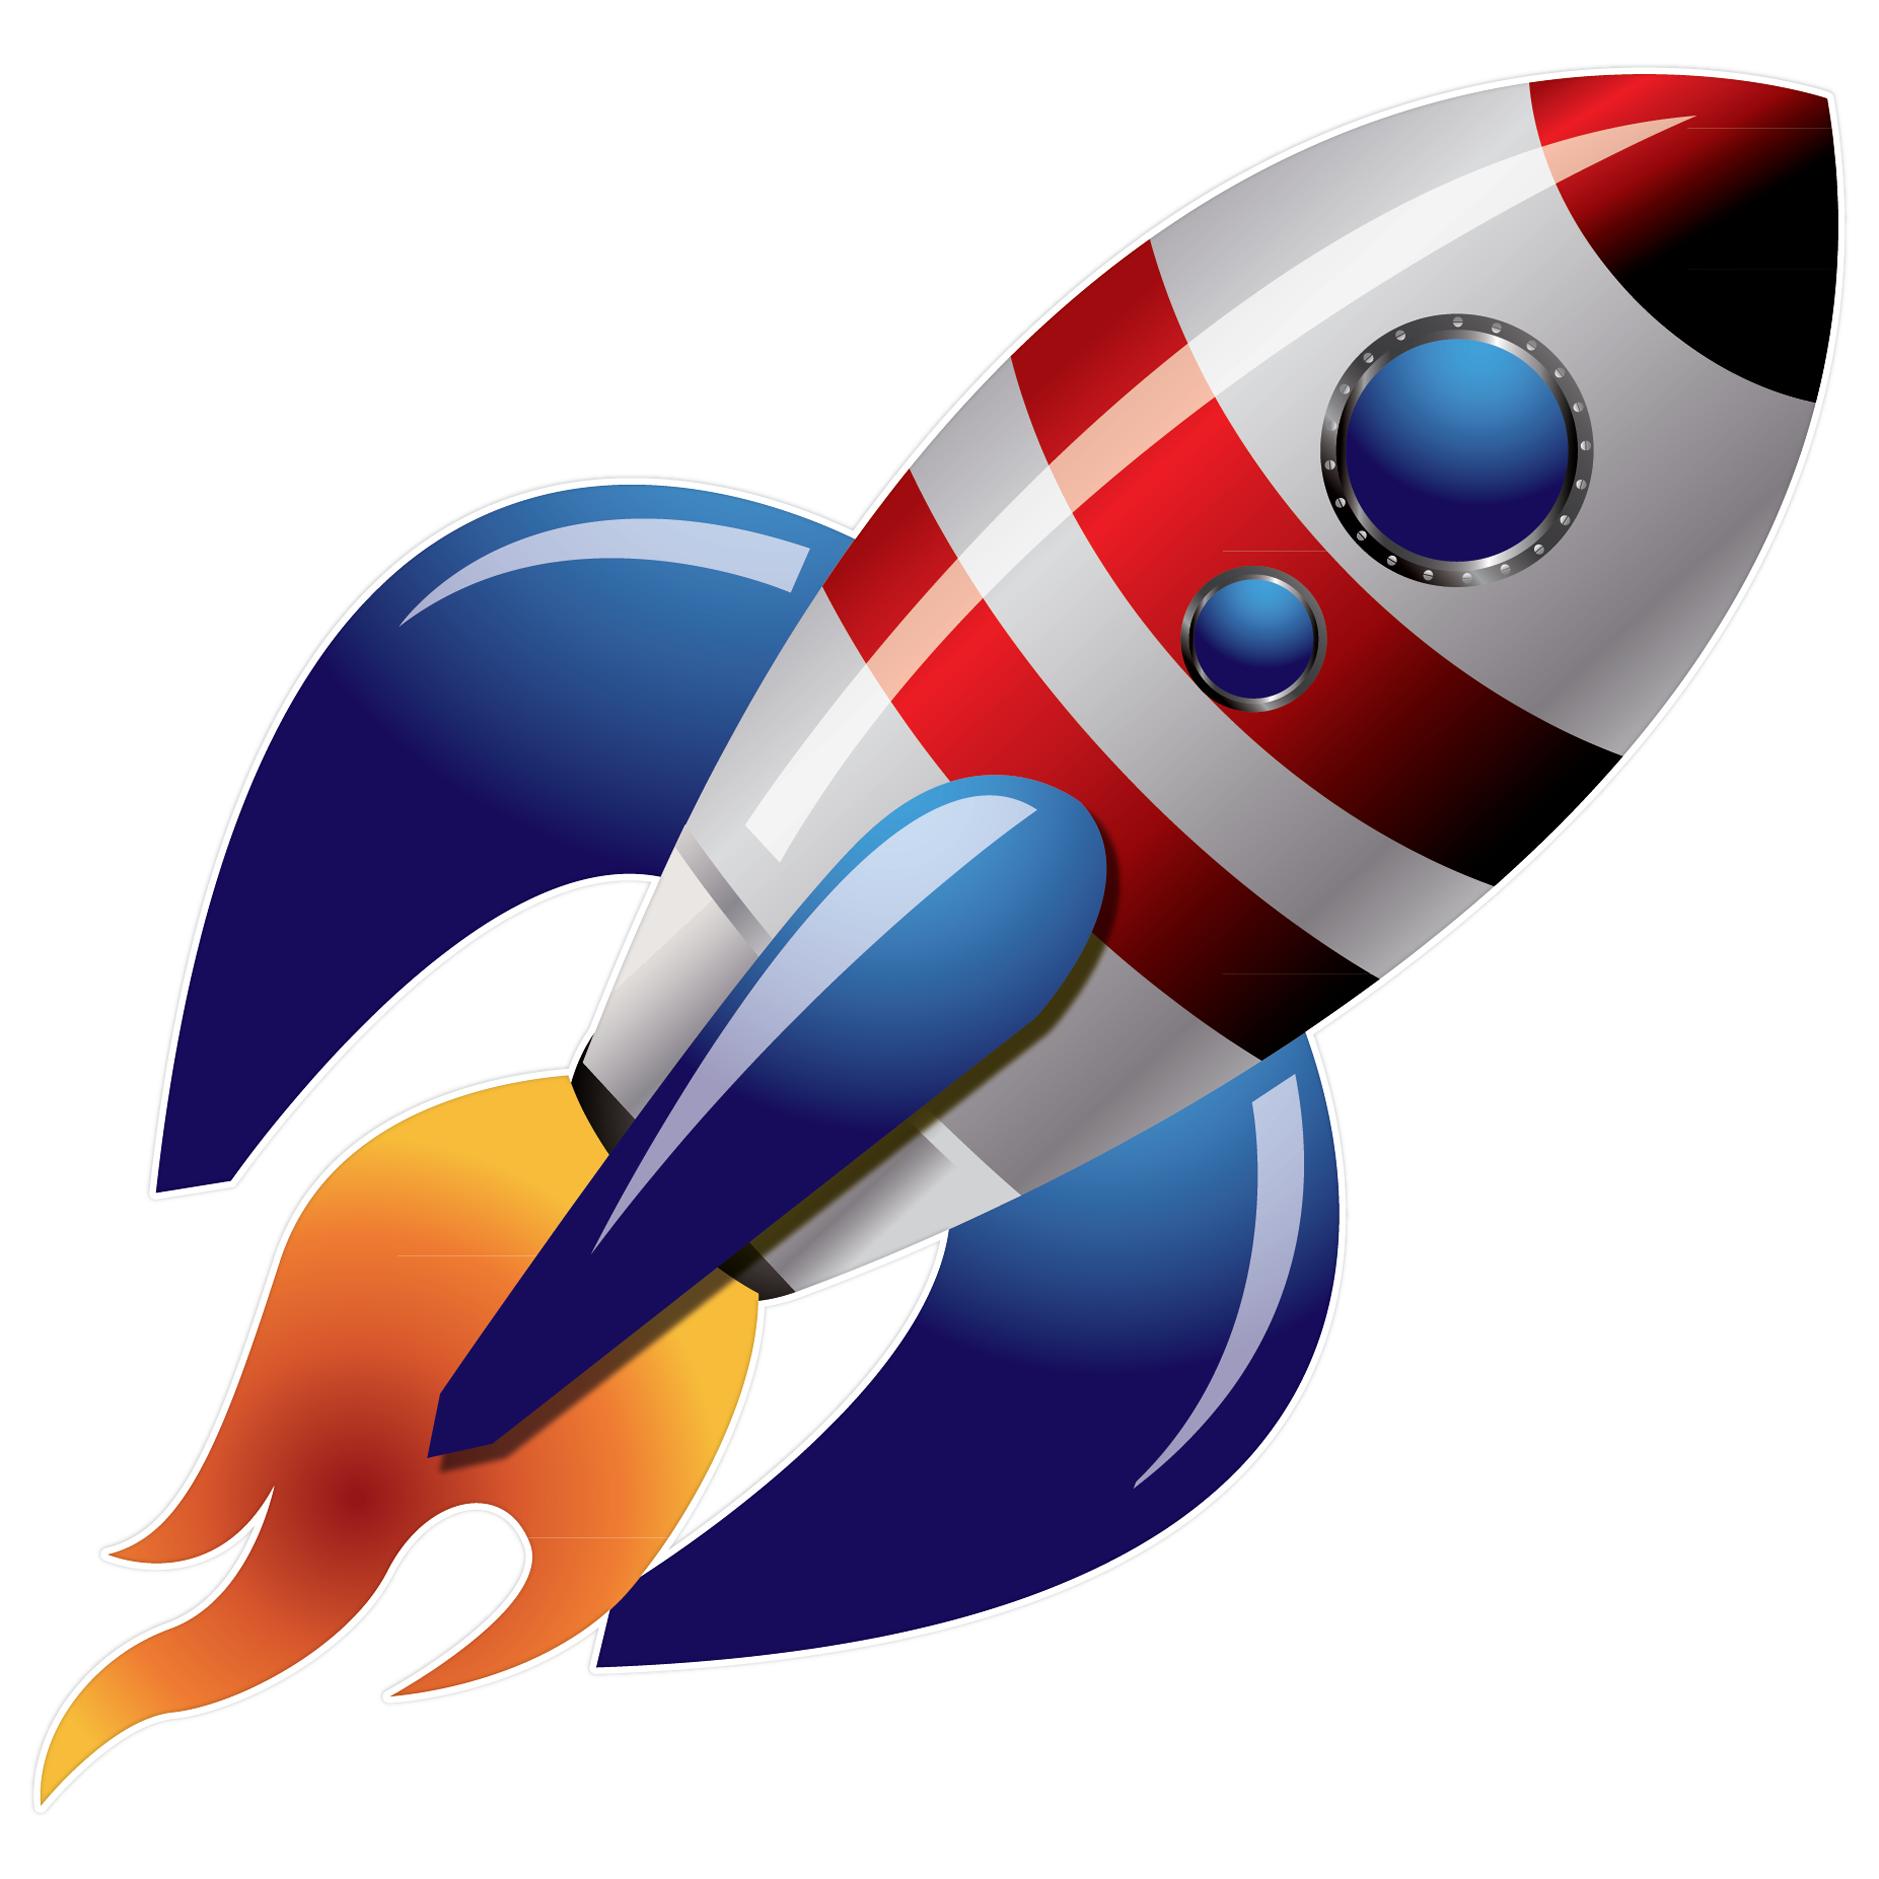 Rocket net worth salary